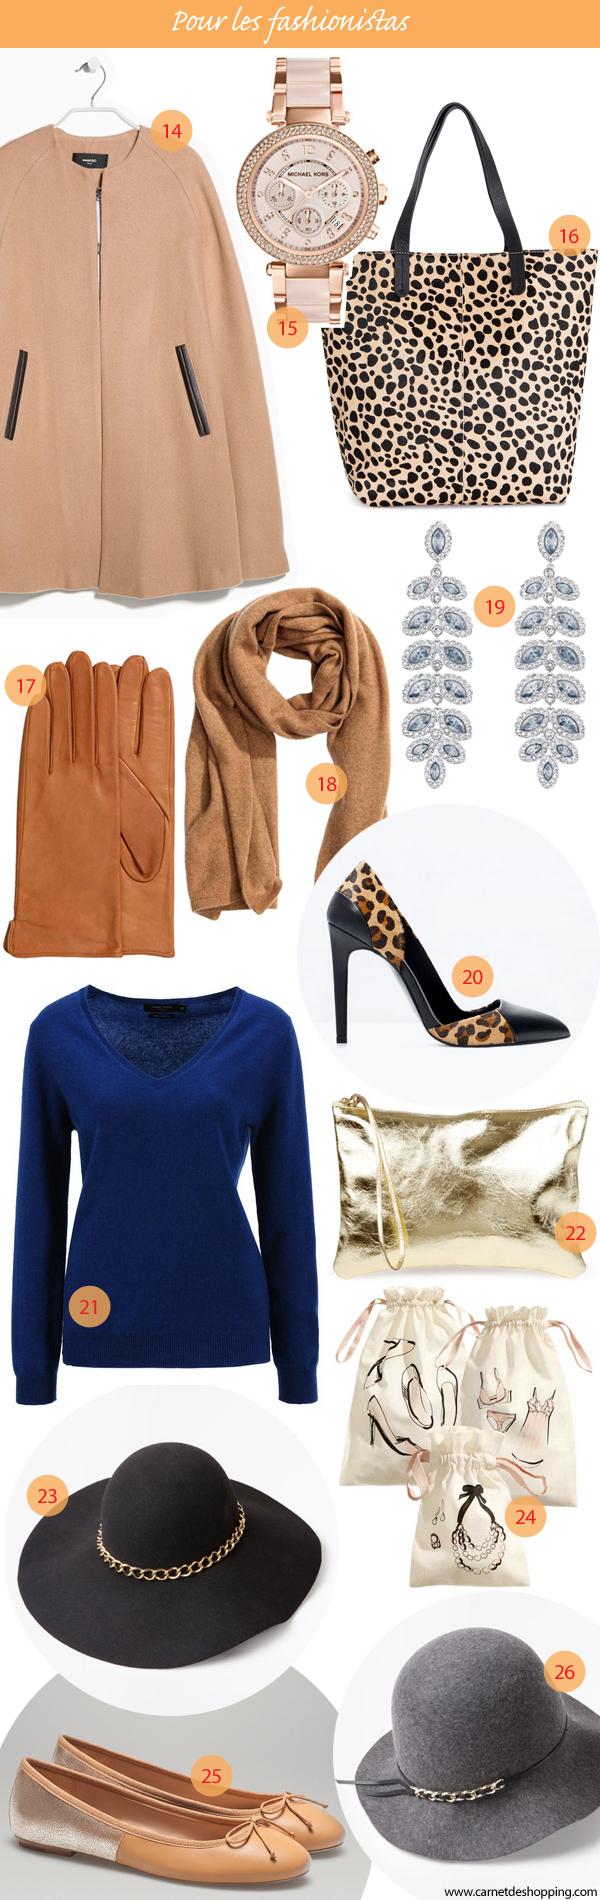 Cadeaux Noël 2014 mode